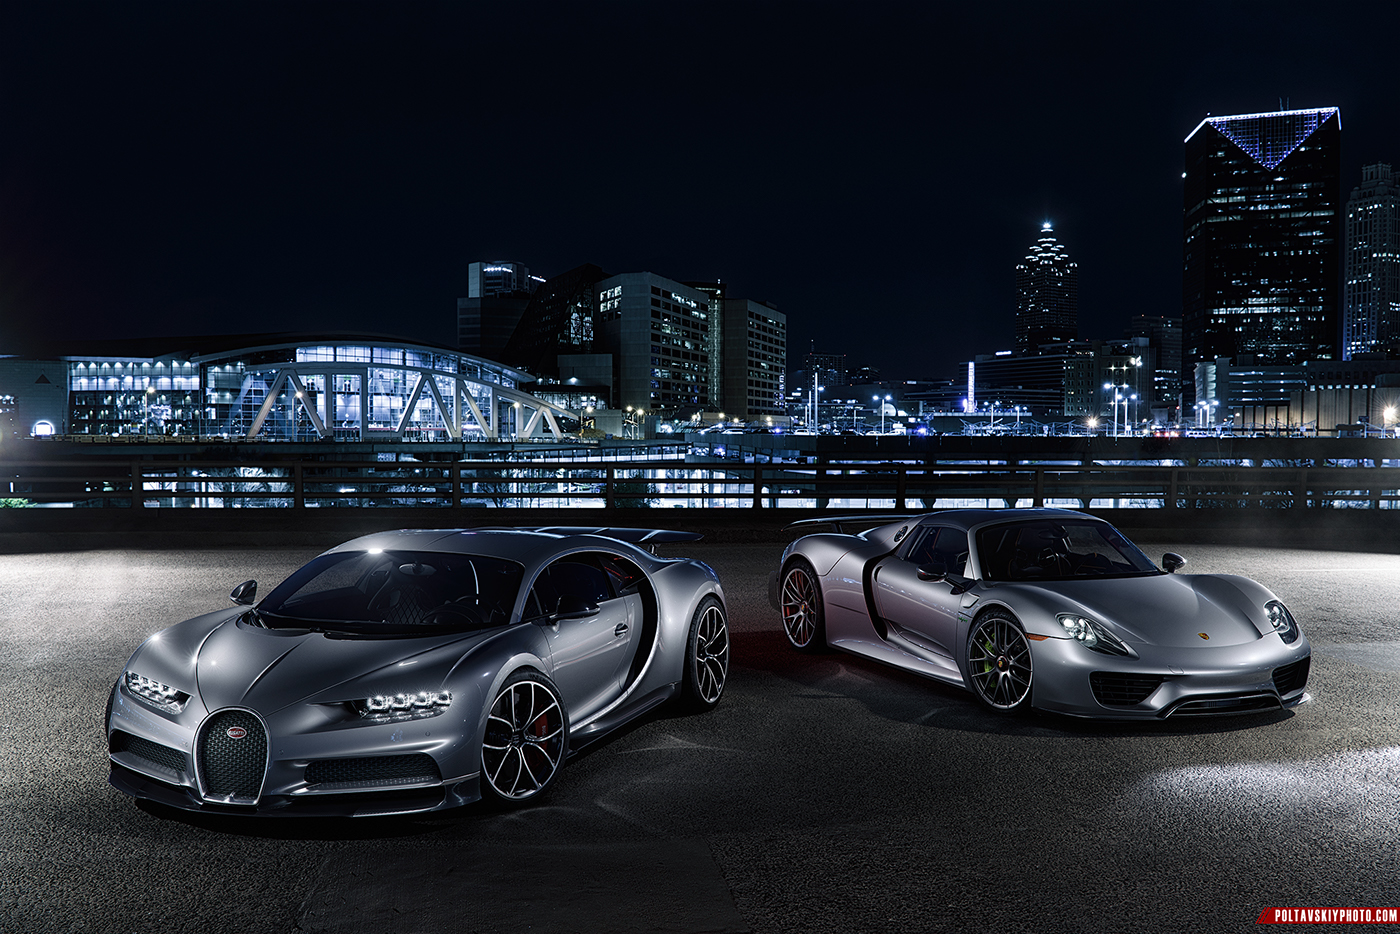 Bugatti Chiron Porsche 918 Cgi Amp Retouching On Behance